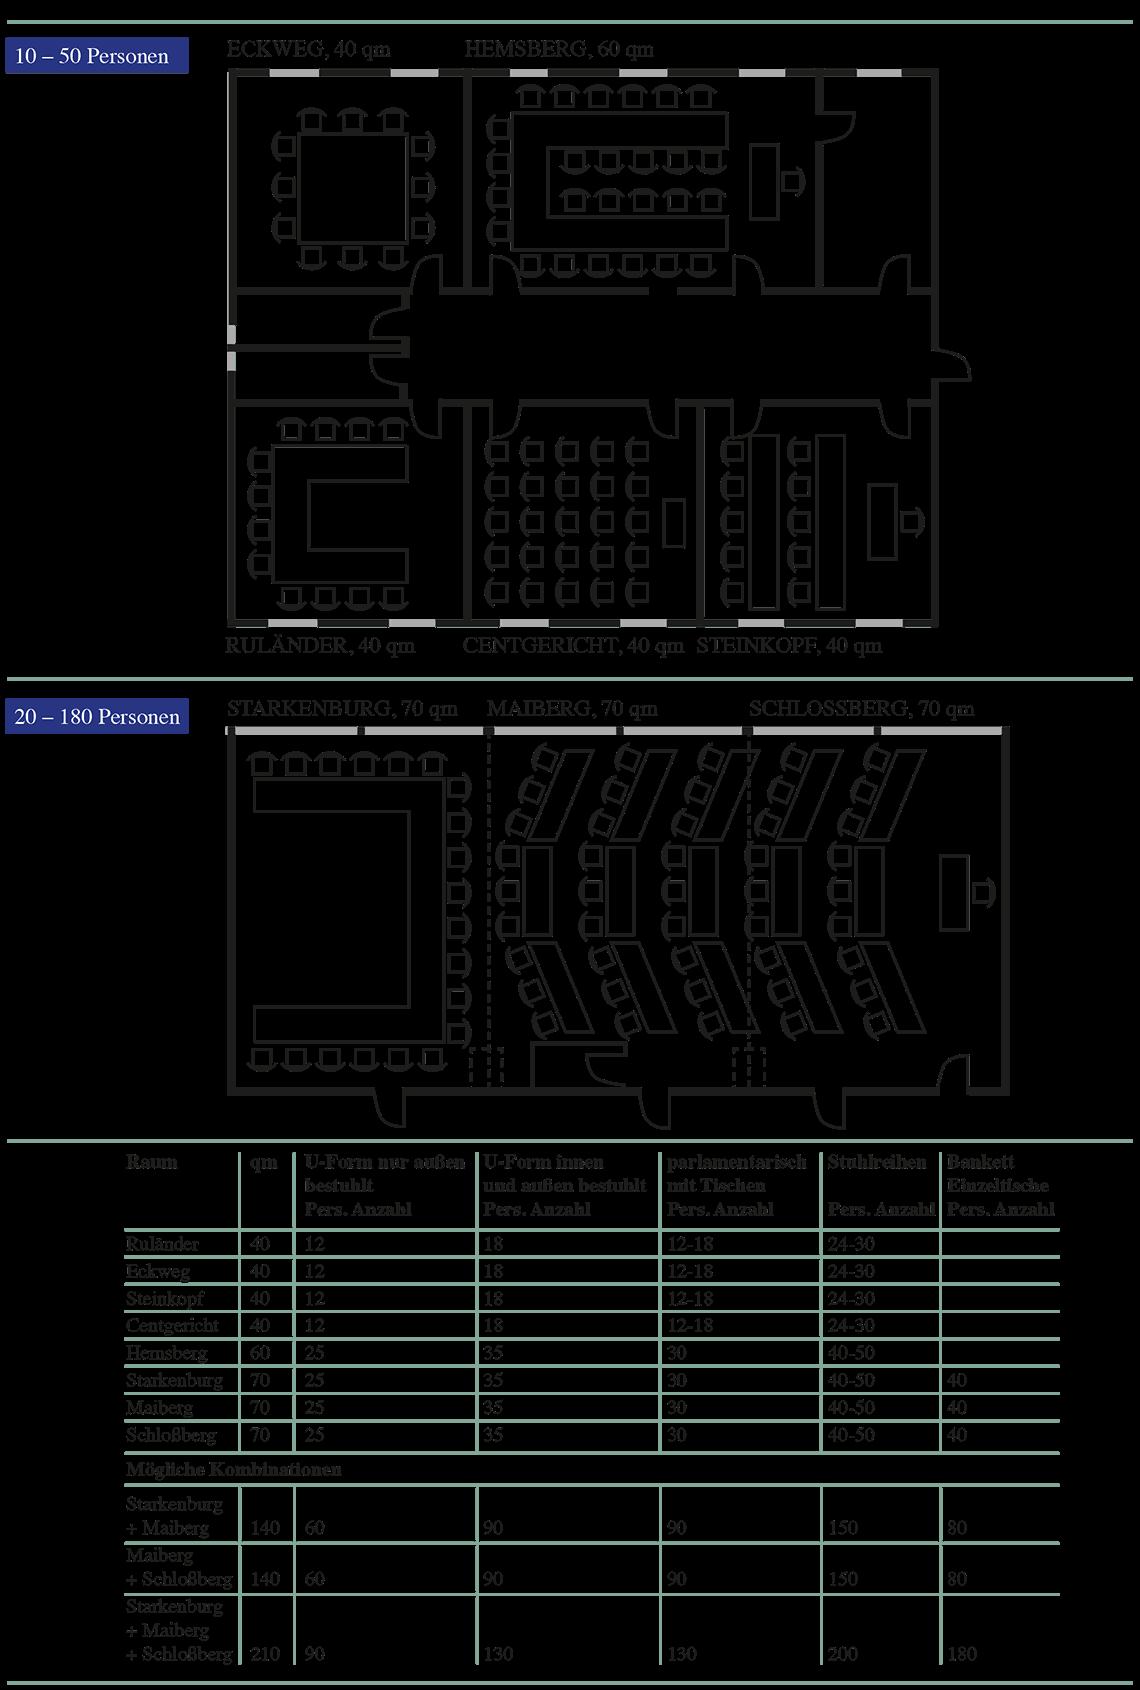 Tagungsräume-Tabelle